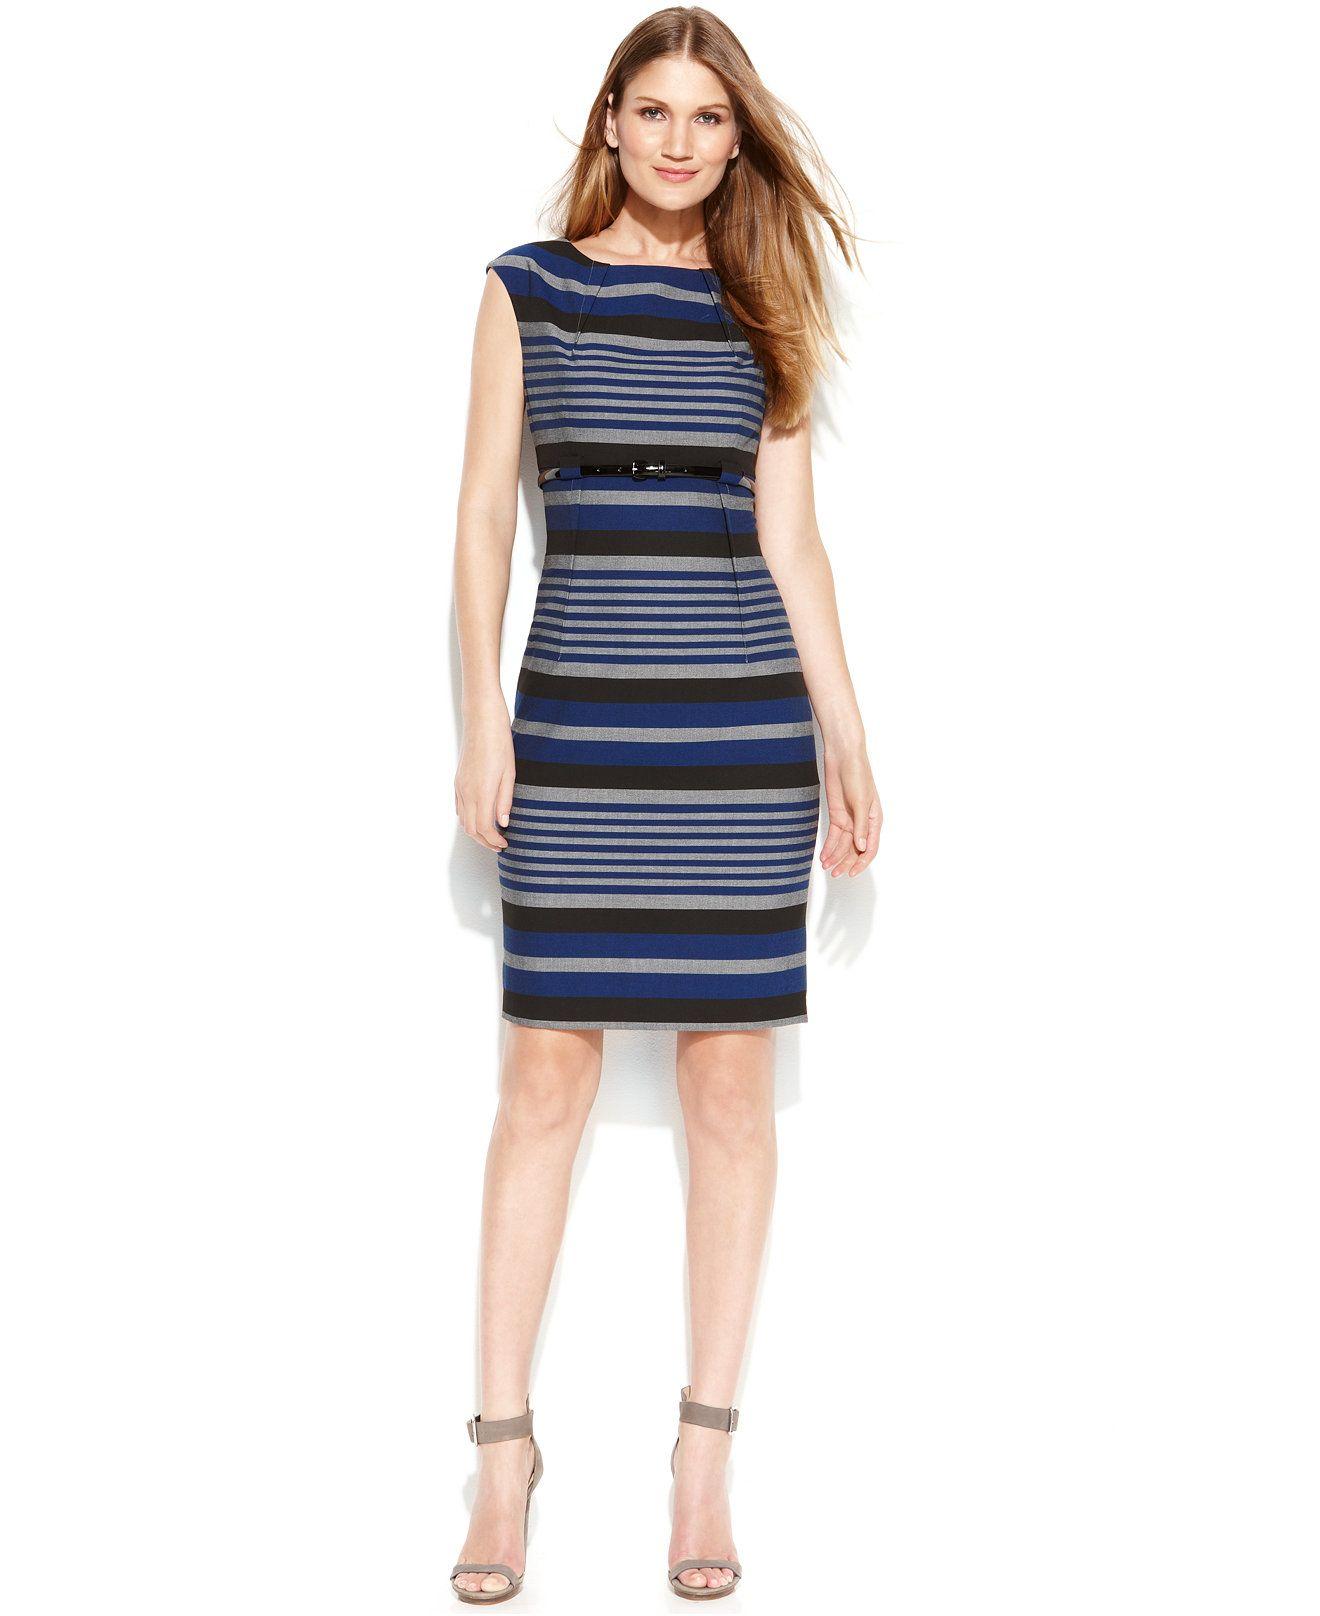 fc1878e4 Calvin Klein Cap-Sleeve Belted Striped Sheath - Dresses - Women - Macy's